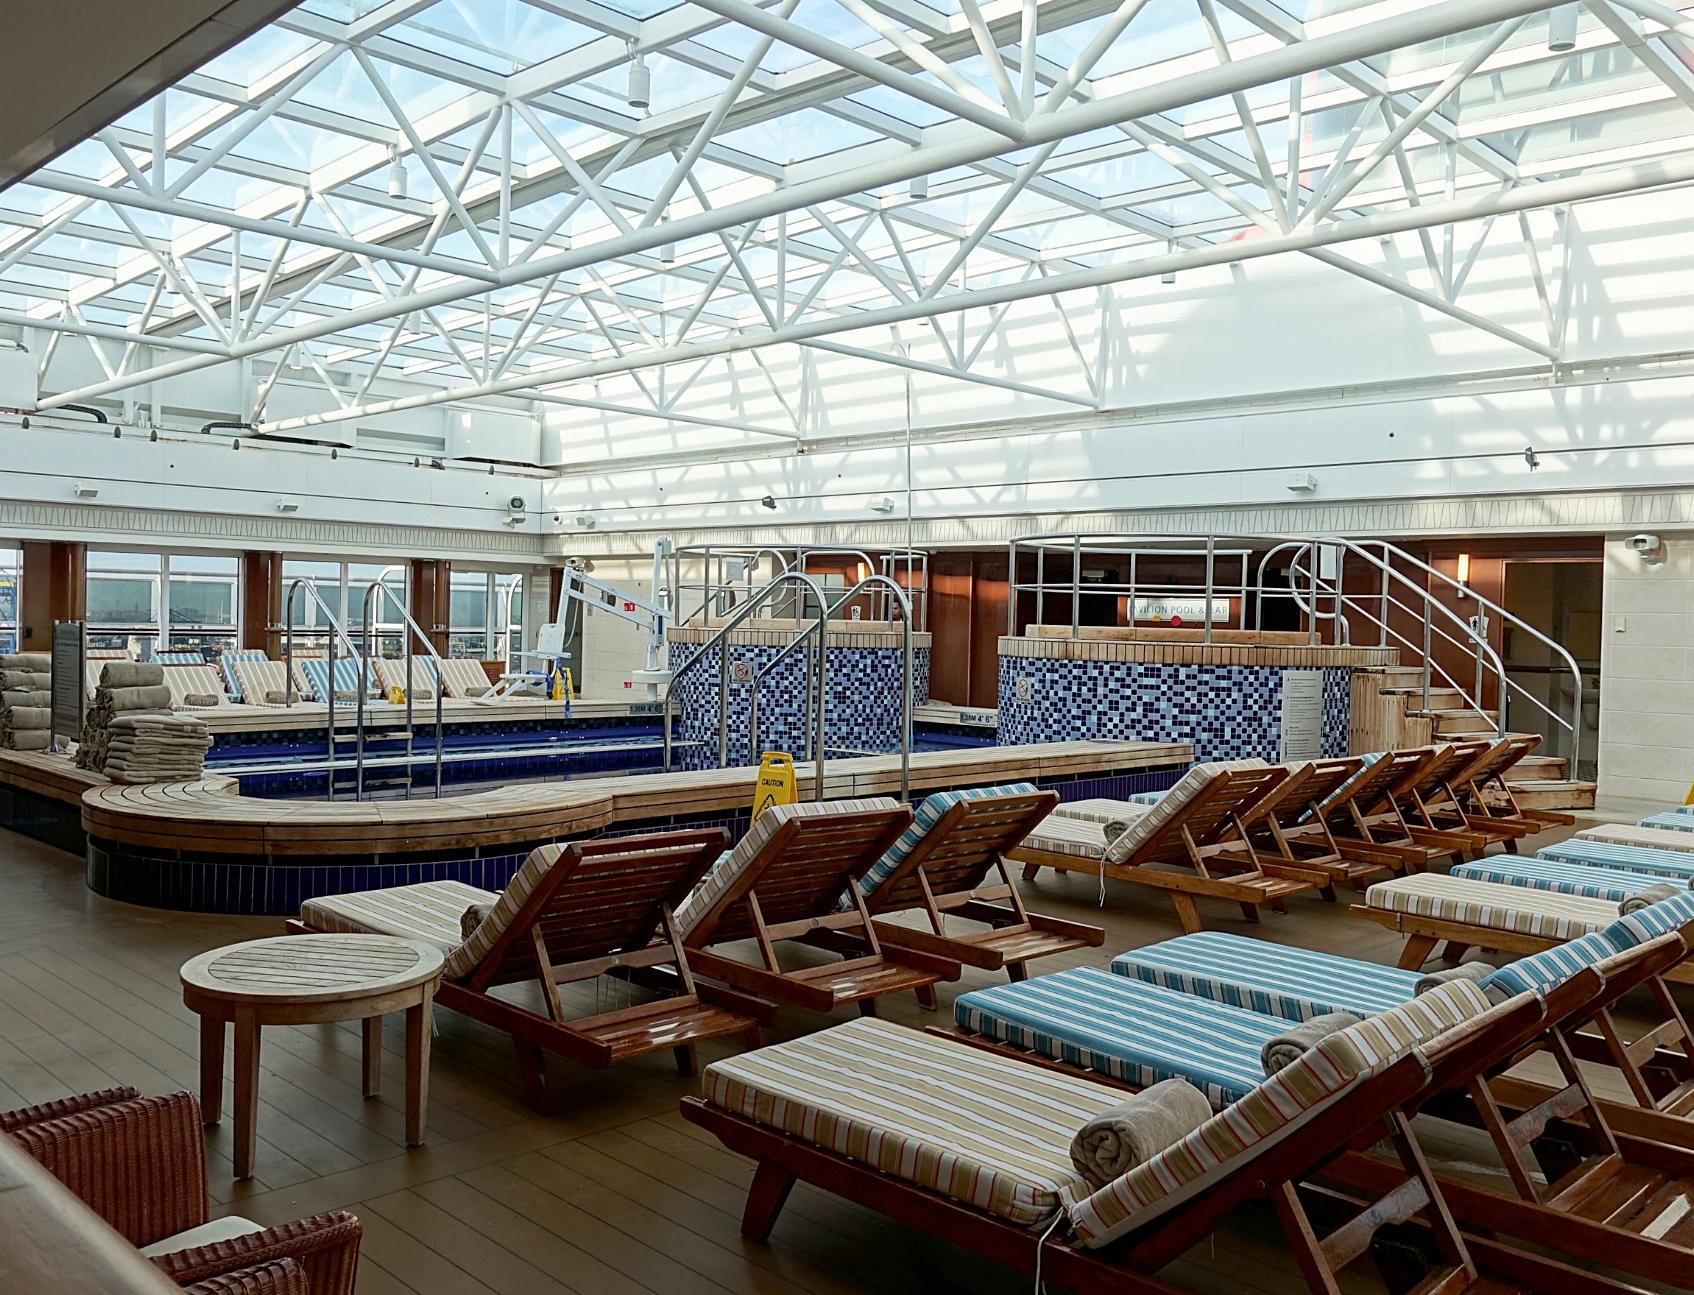 The upper deck indoor pool with retractable roof.